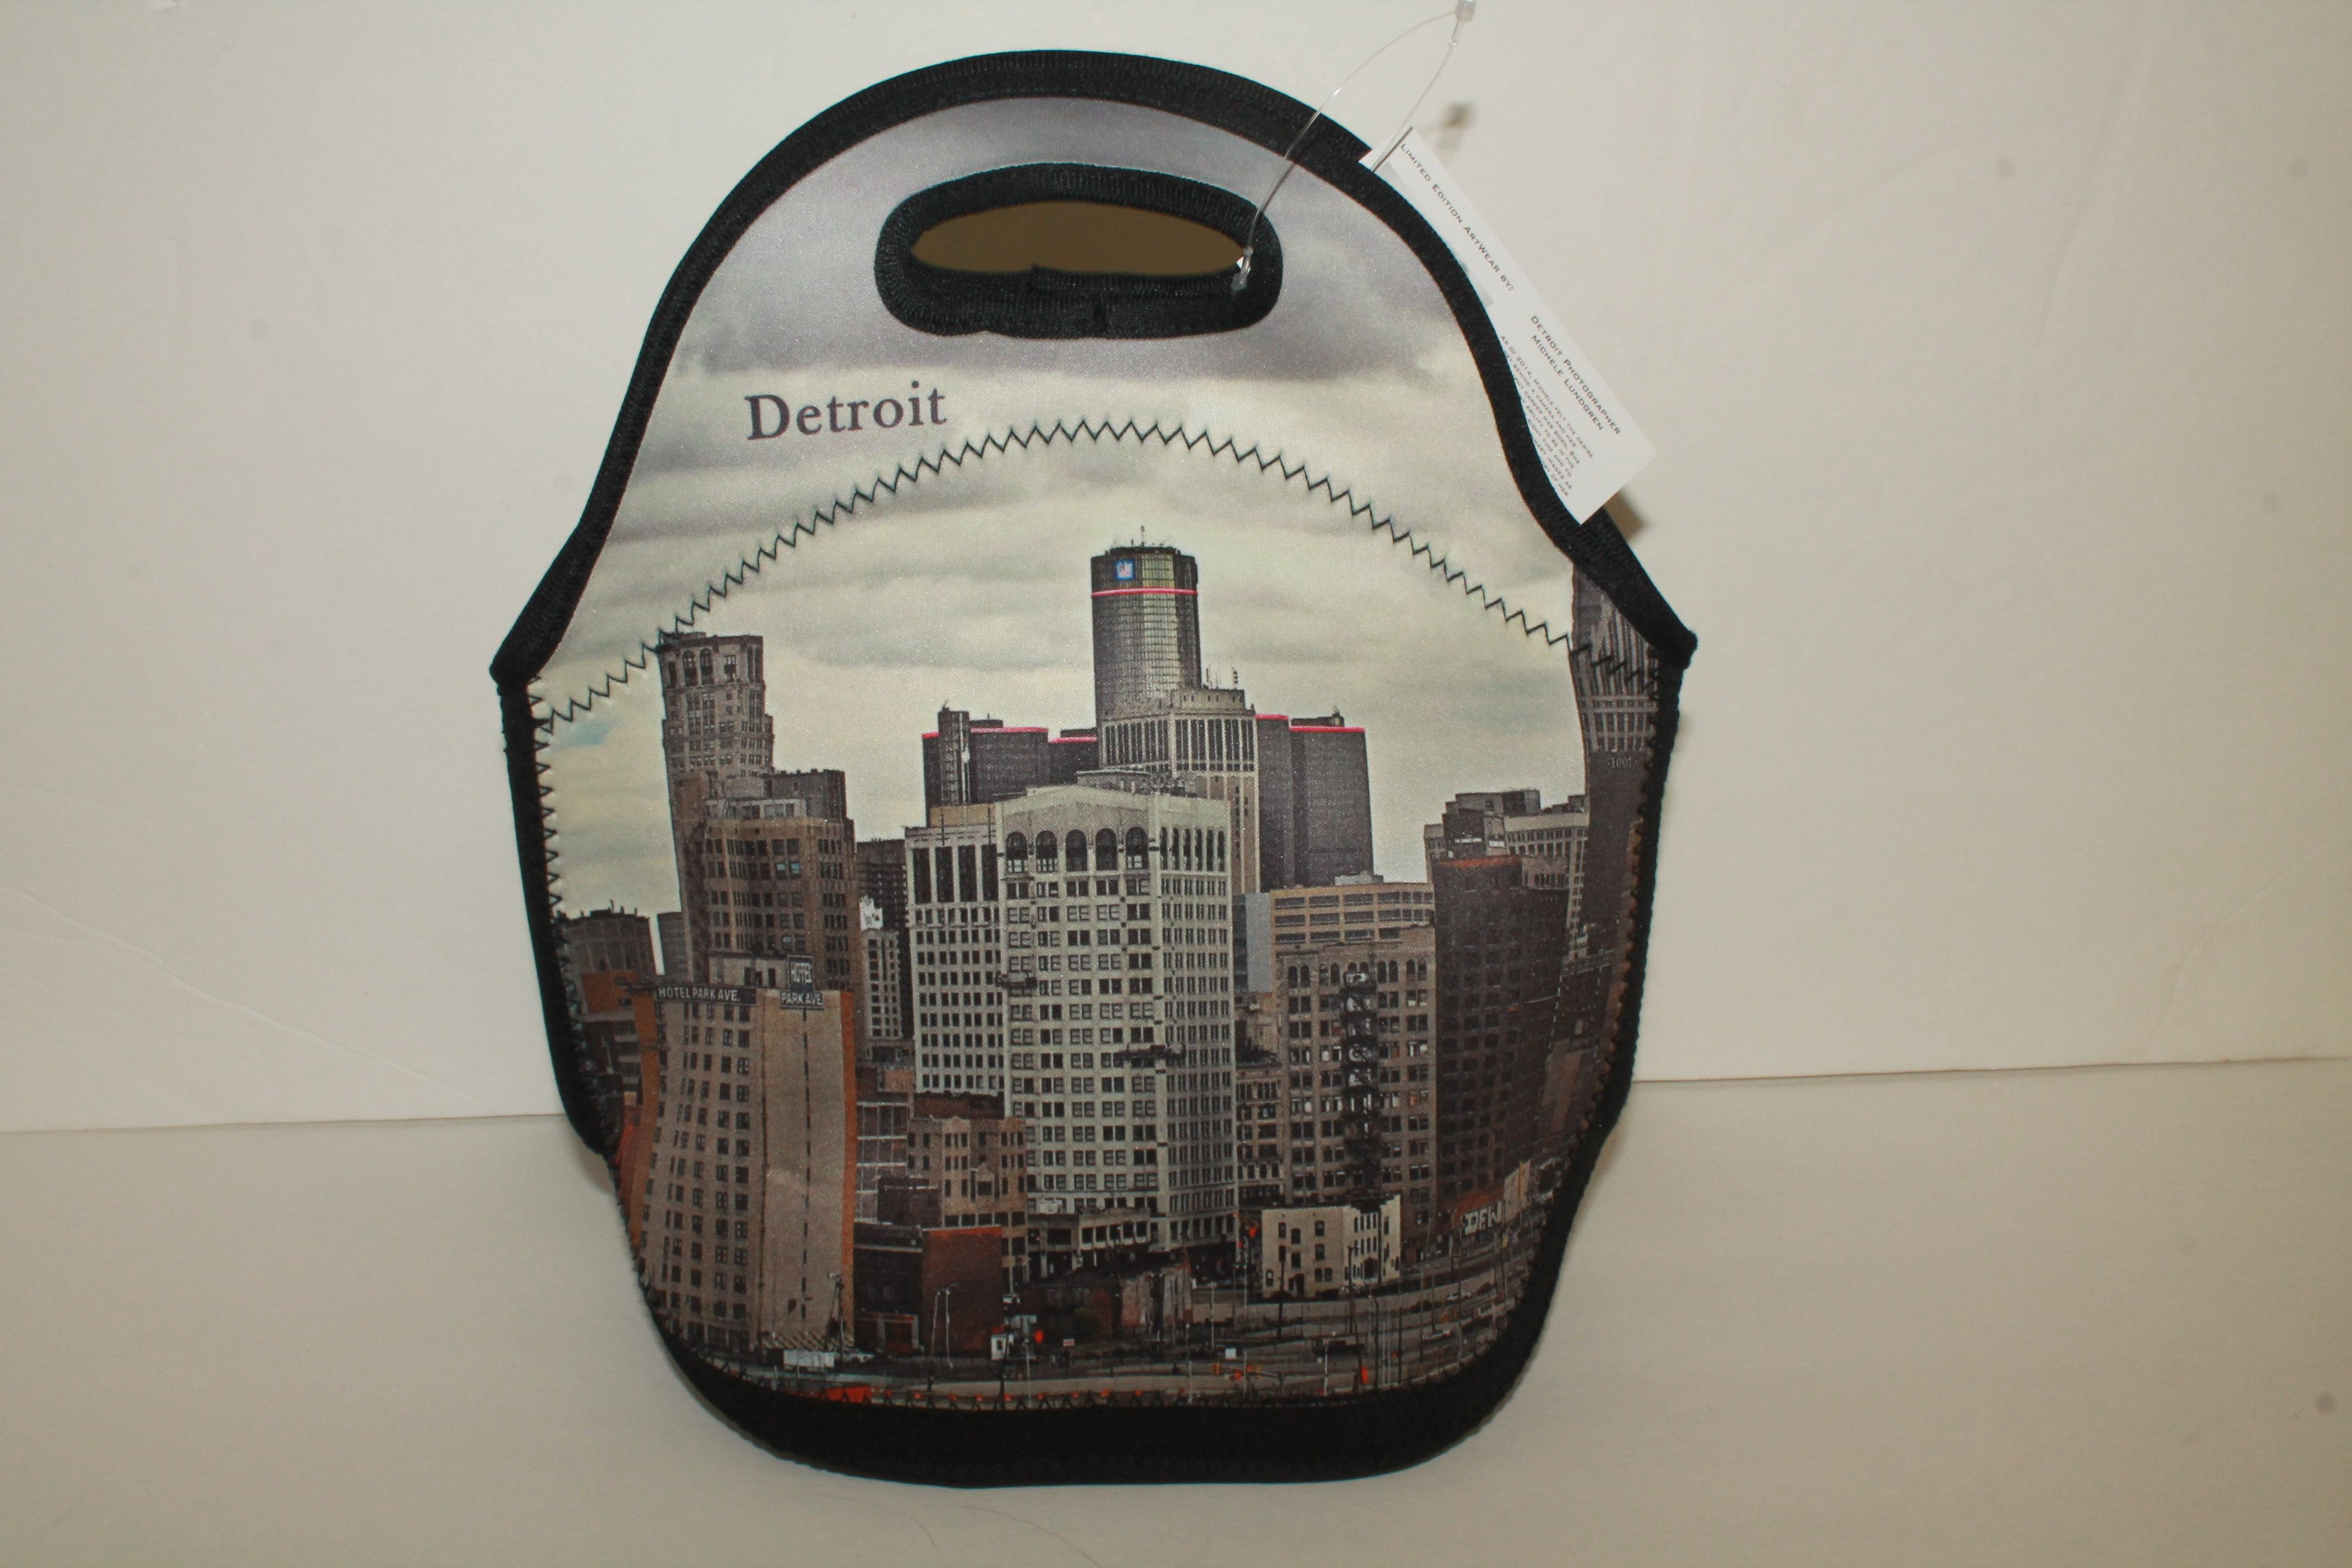 Art Wear Detroit Cooler tote/lunch bag 00019